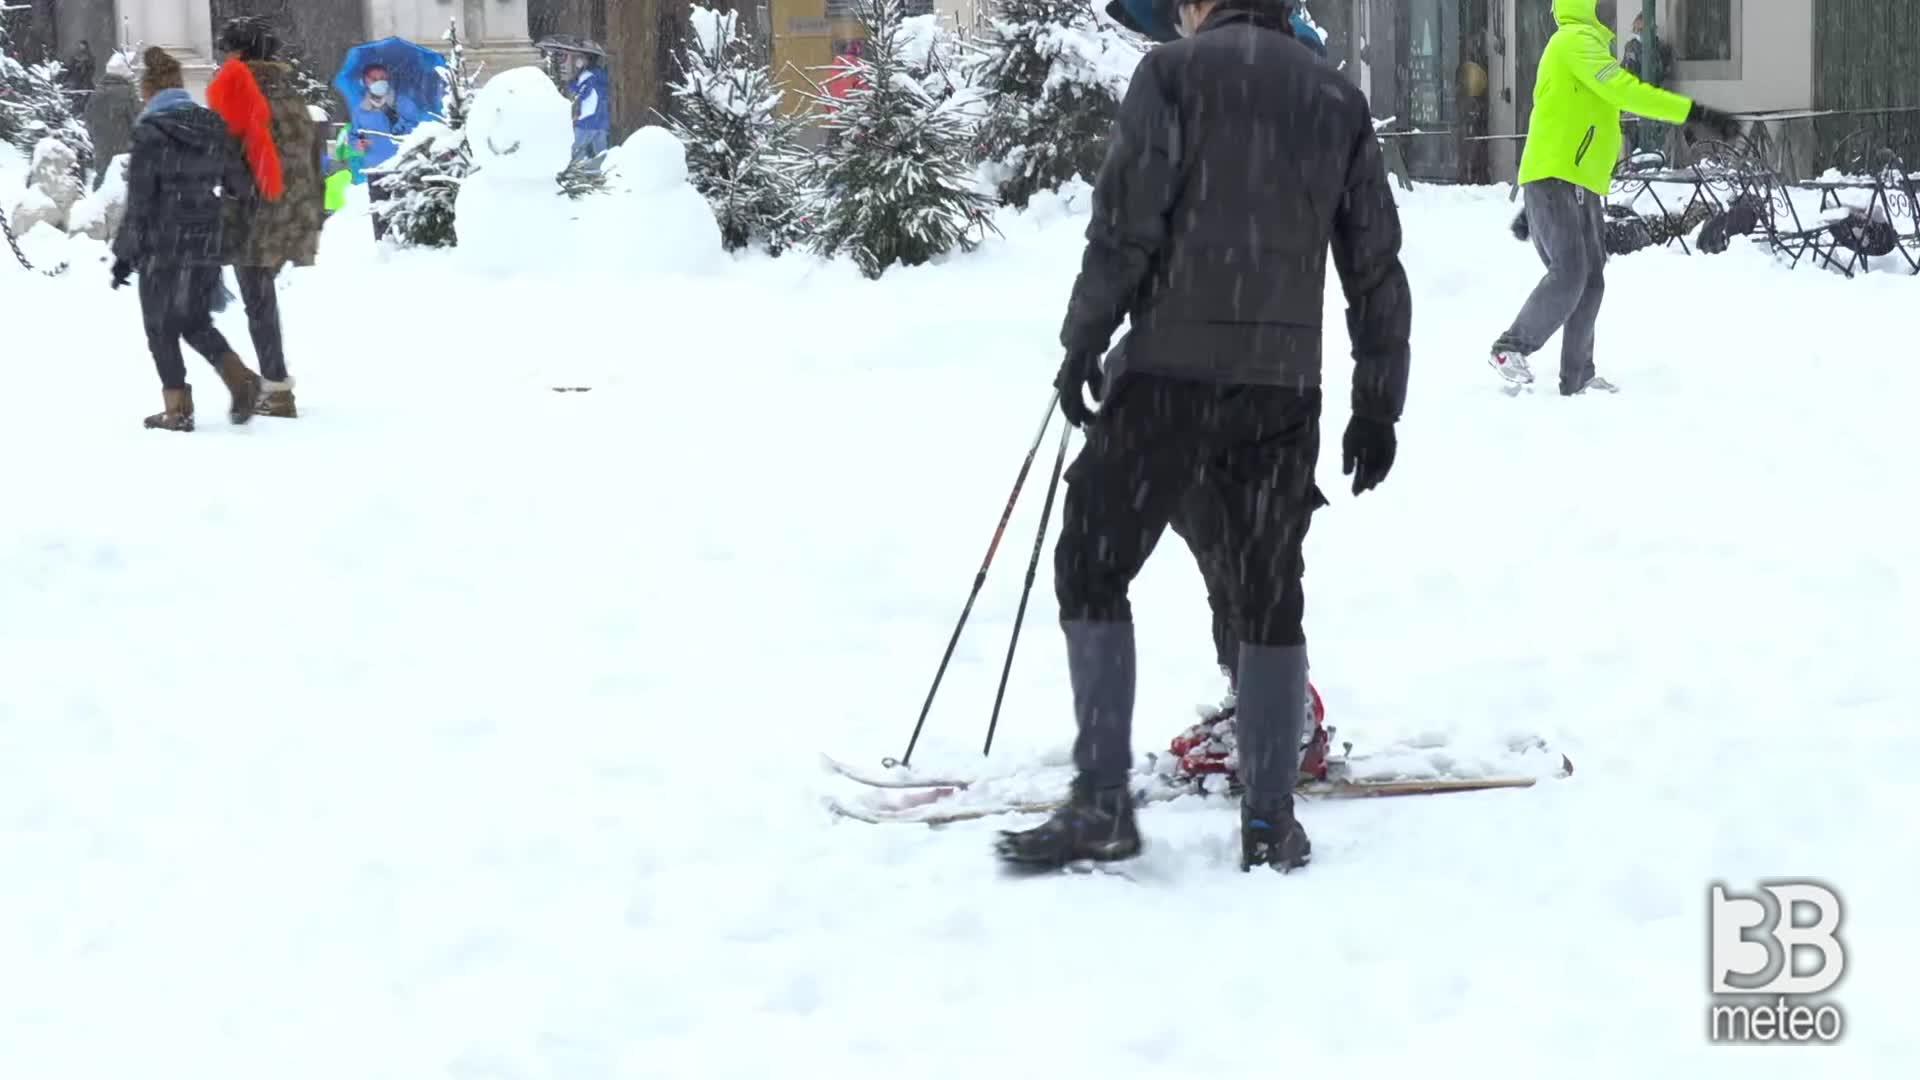 Nevicata a Bergamo : in centro con sci e slittino